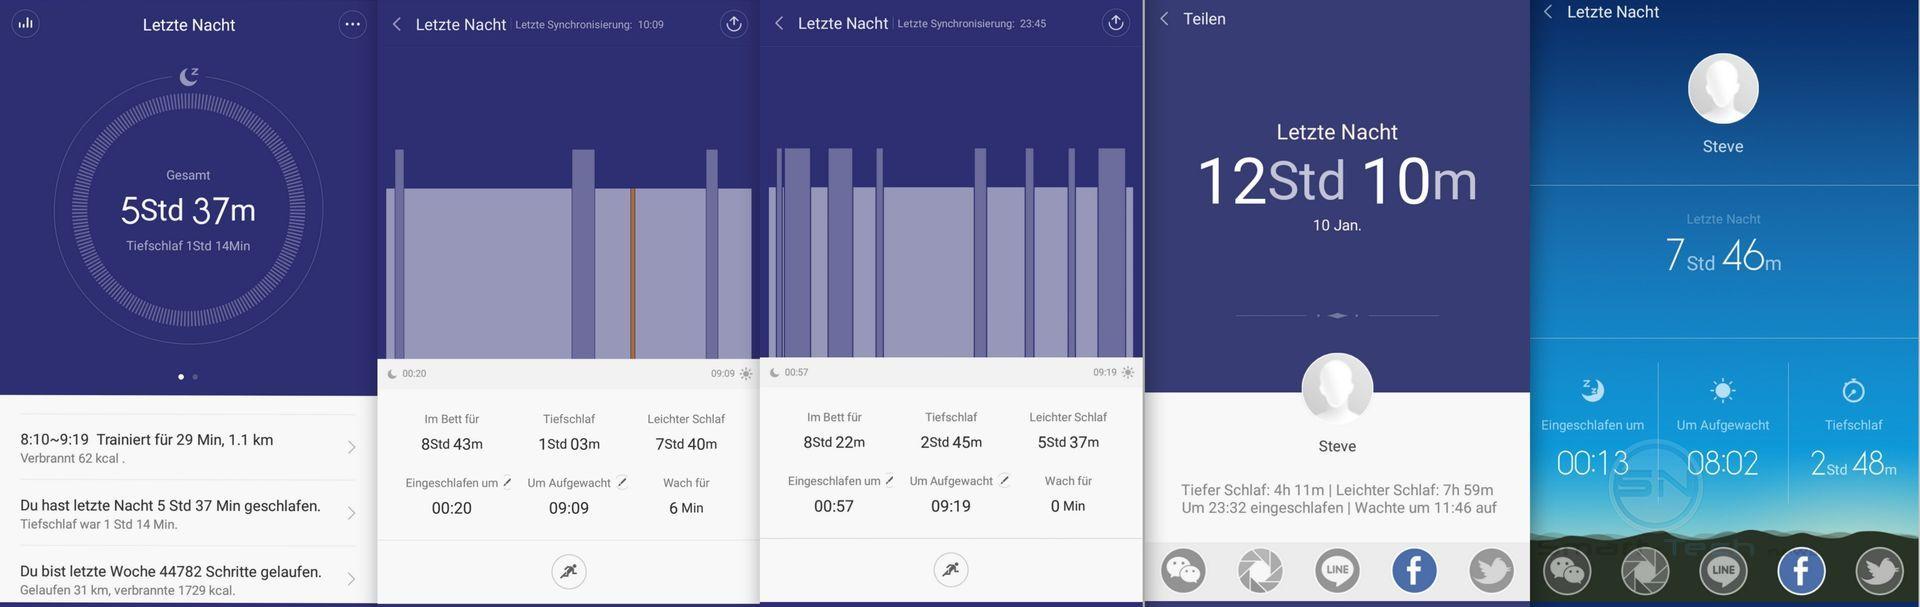 Schlaf Wach Traumphasen Prodokoll - Xiaomi MiBand 1s - SmartTechNews